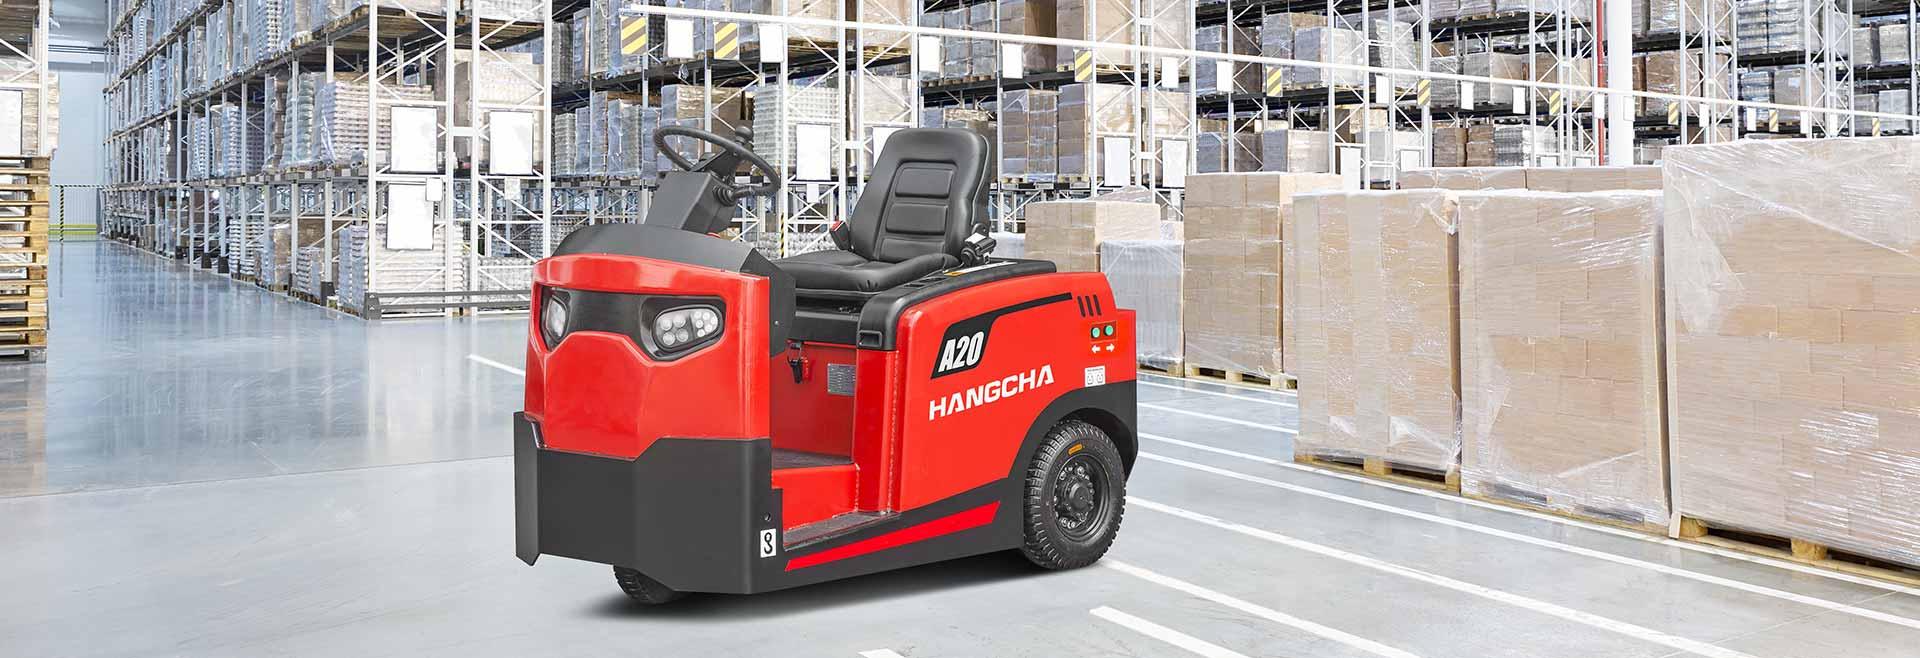 Electric Tow Tractor J Series 2.0 – 6.0t Hangcha Trucks